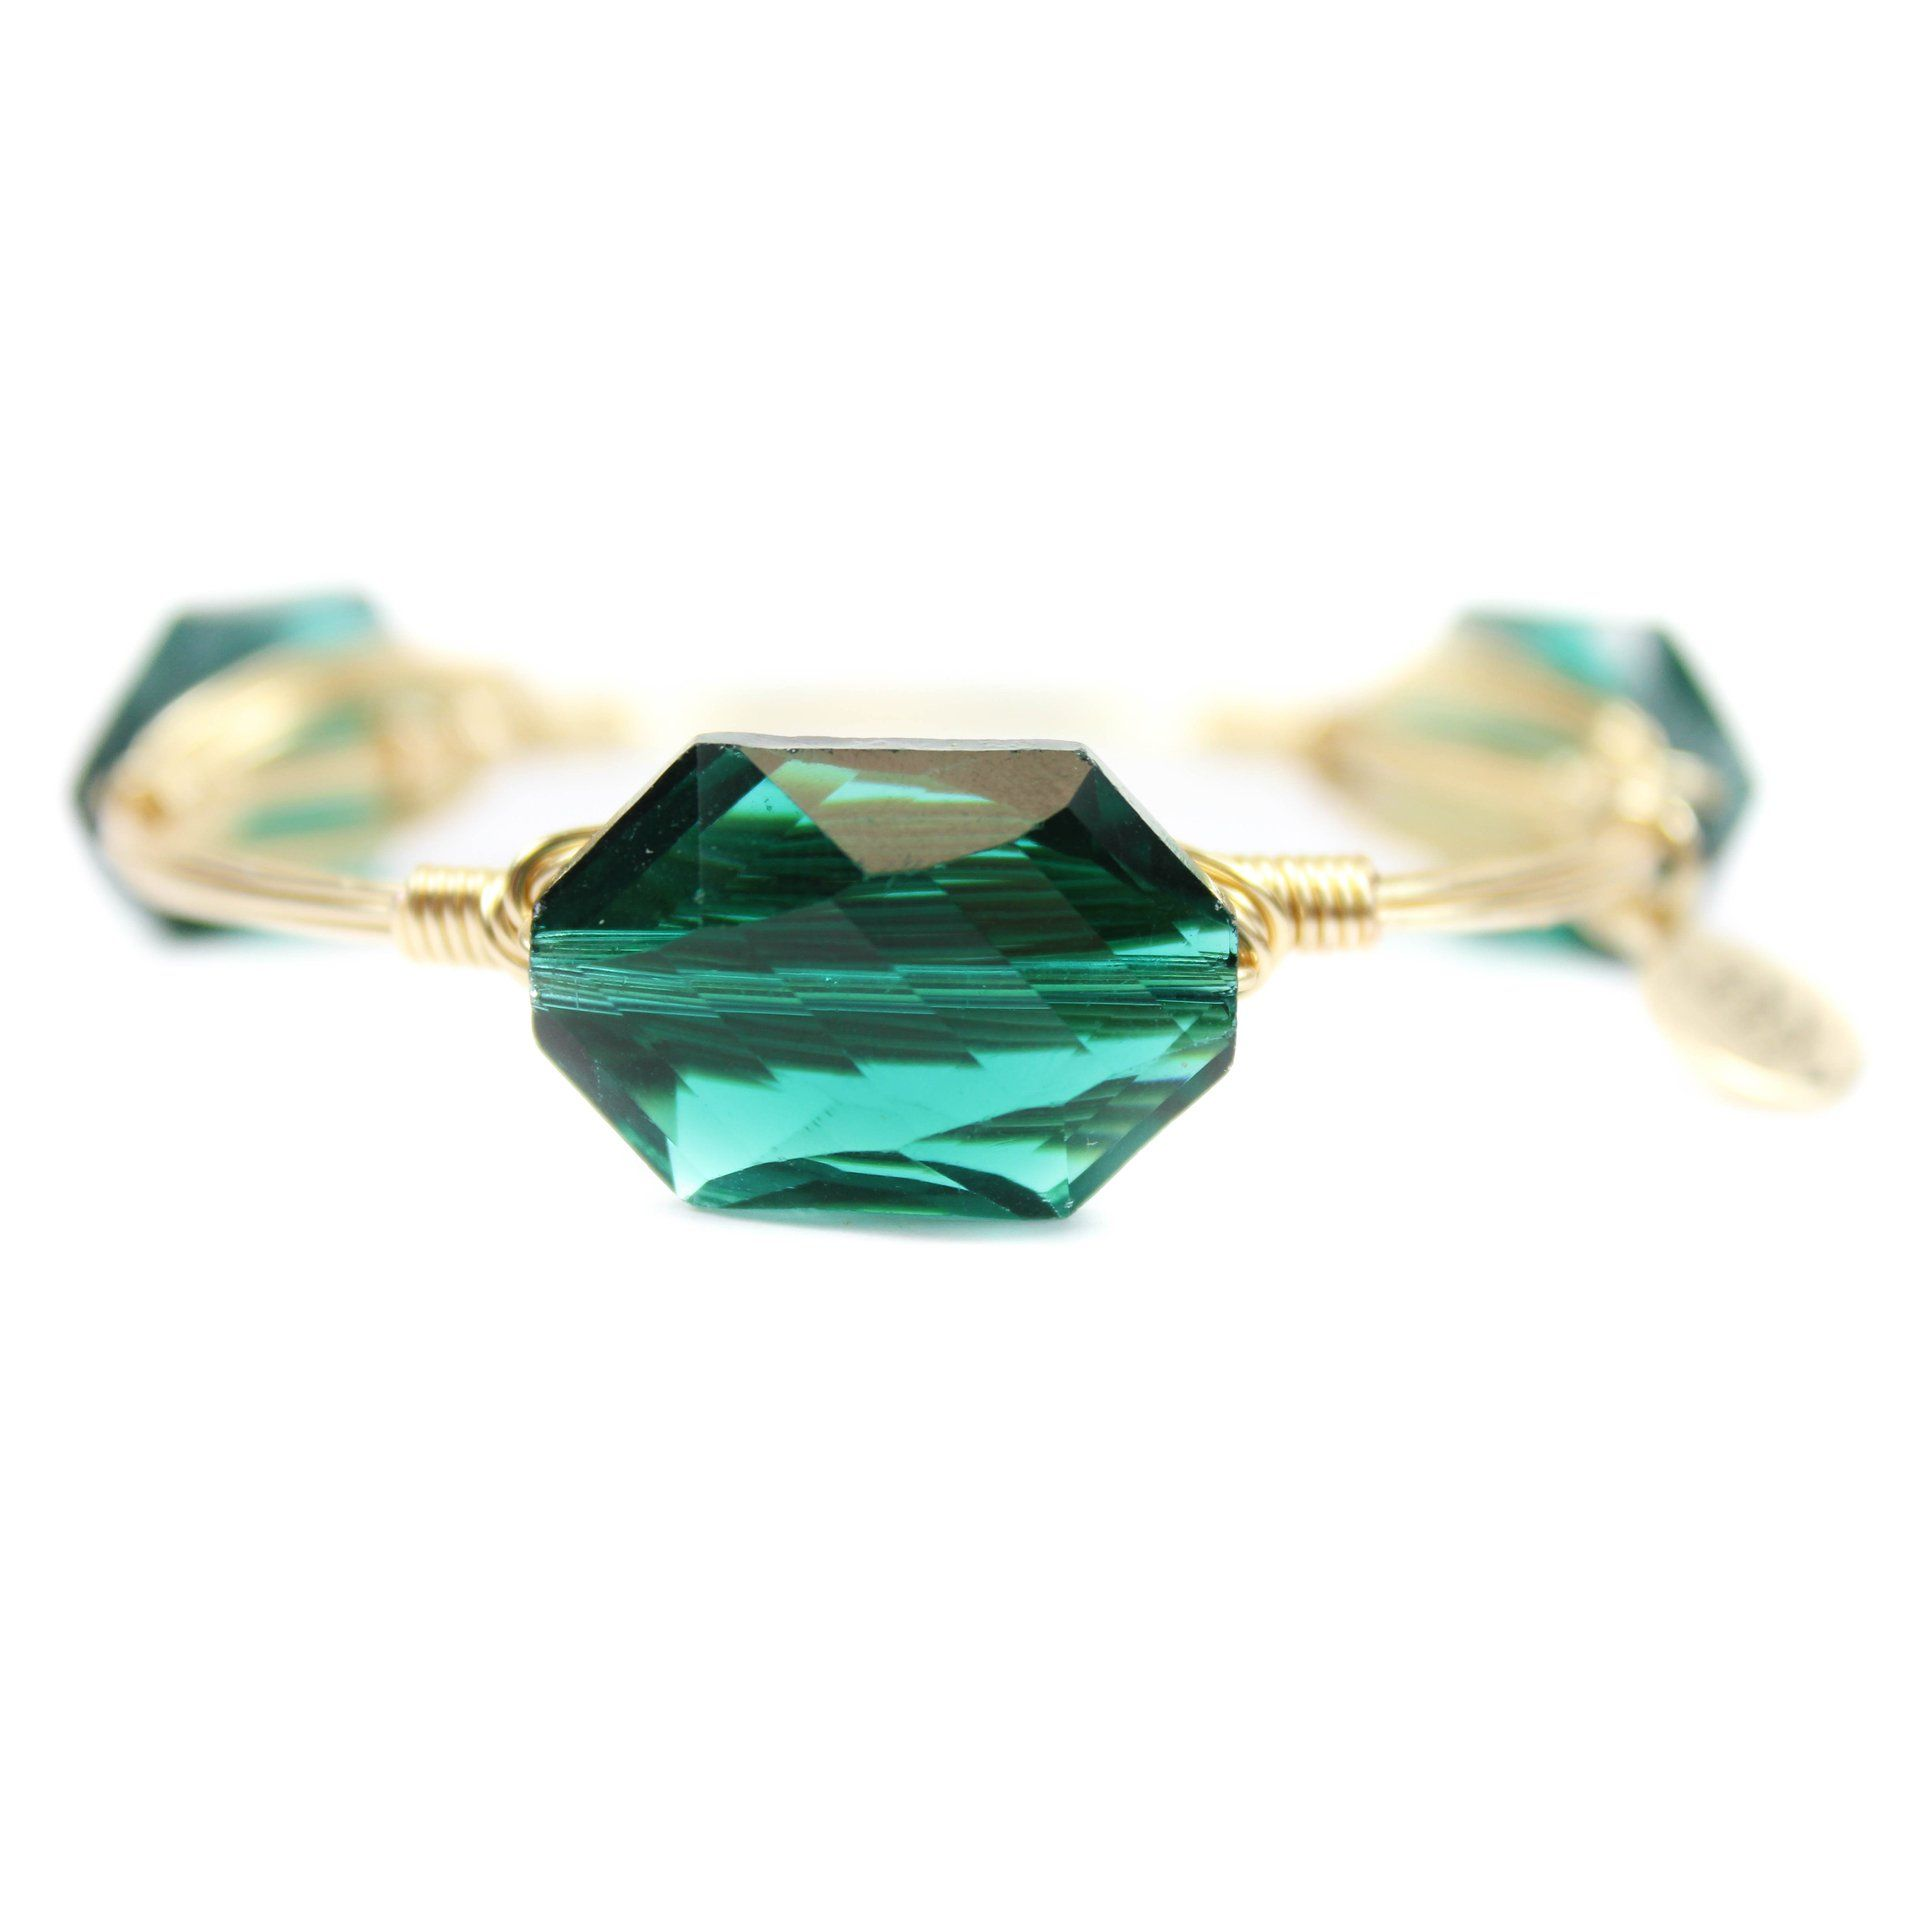 The Giselle Bangle Bracelet